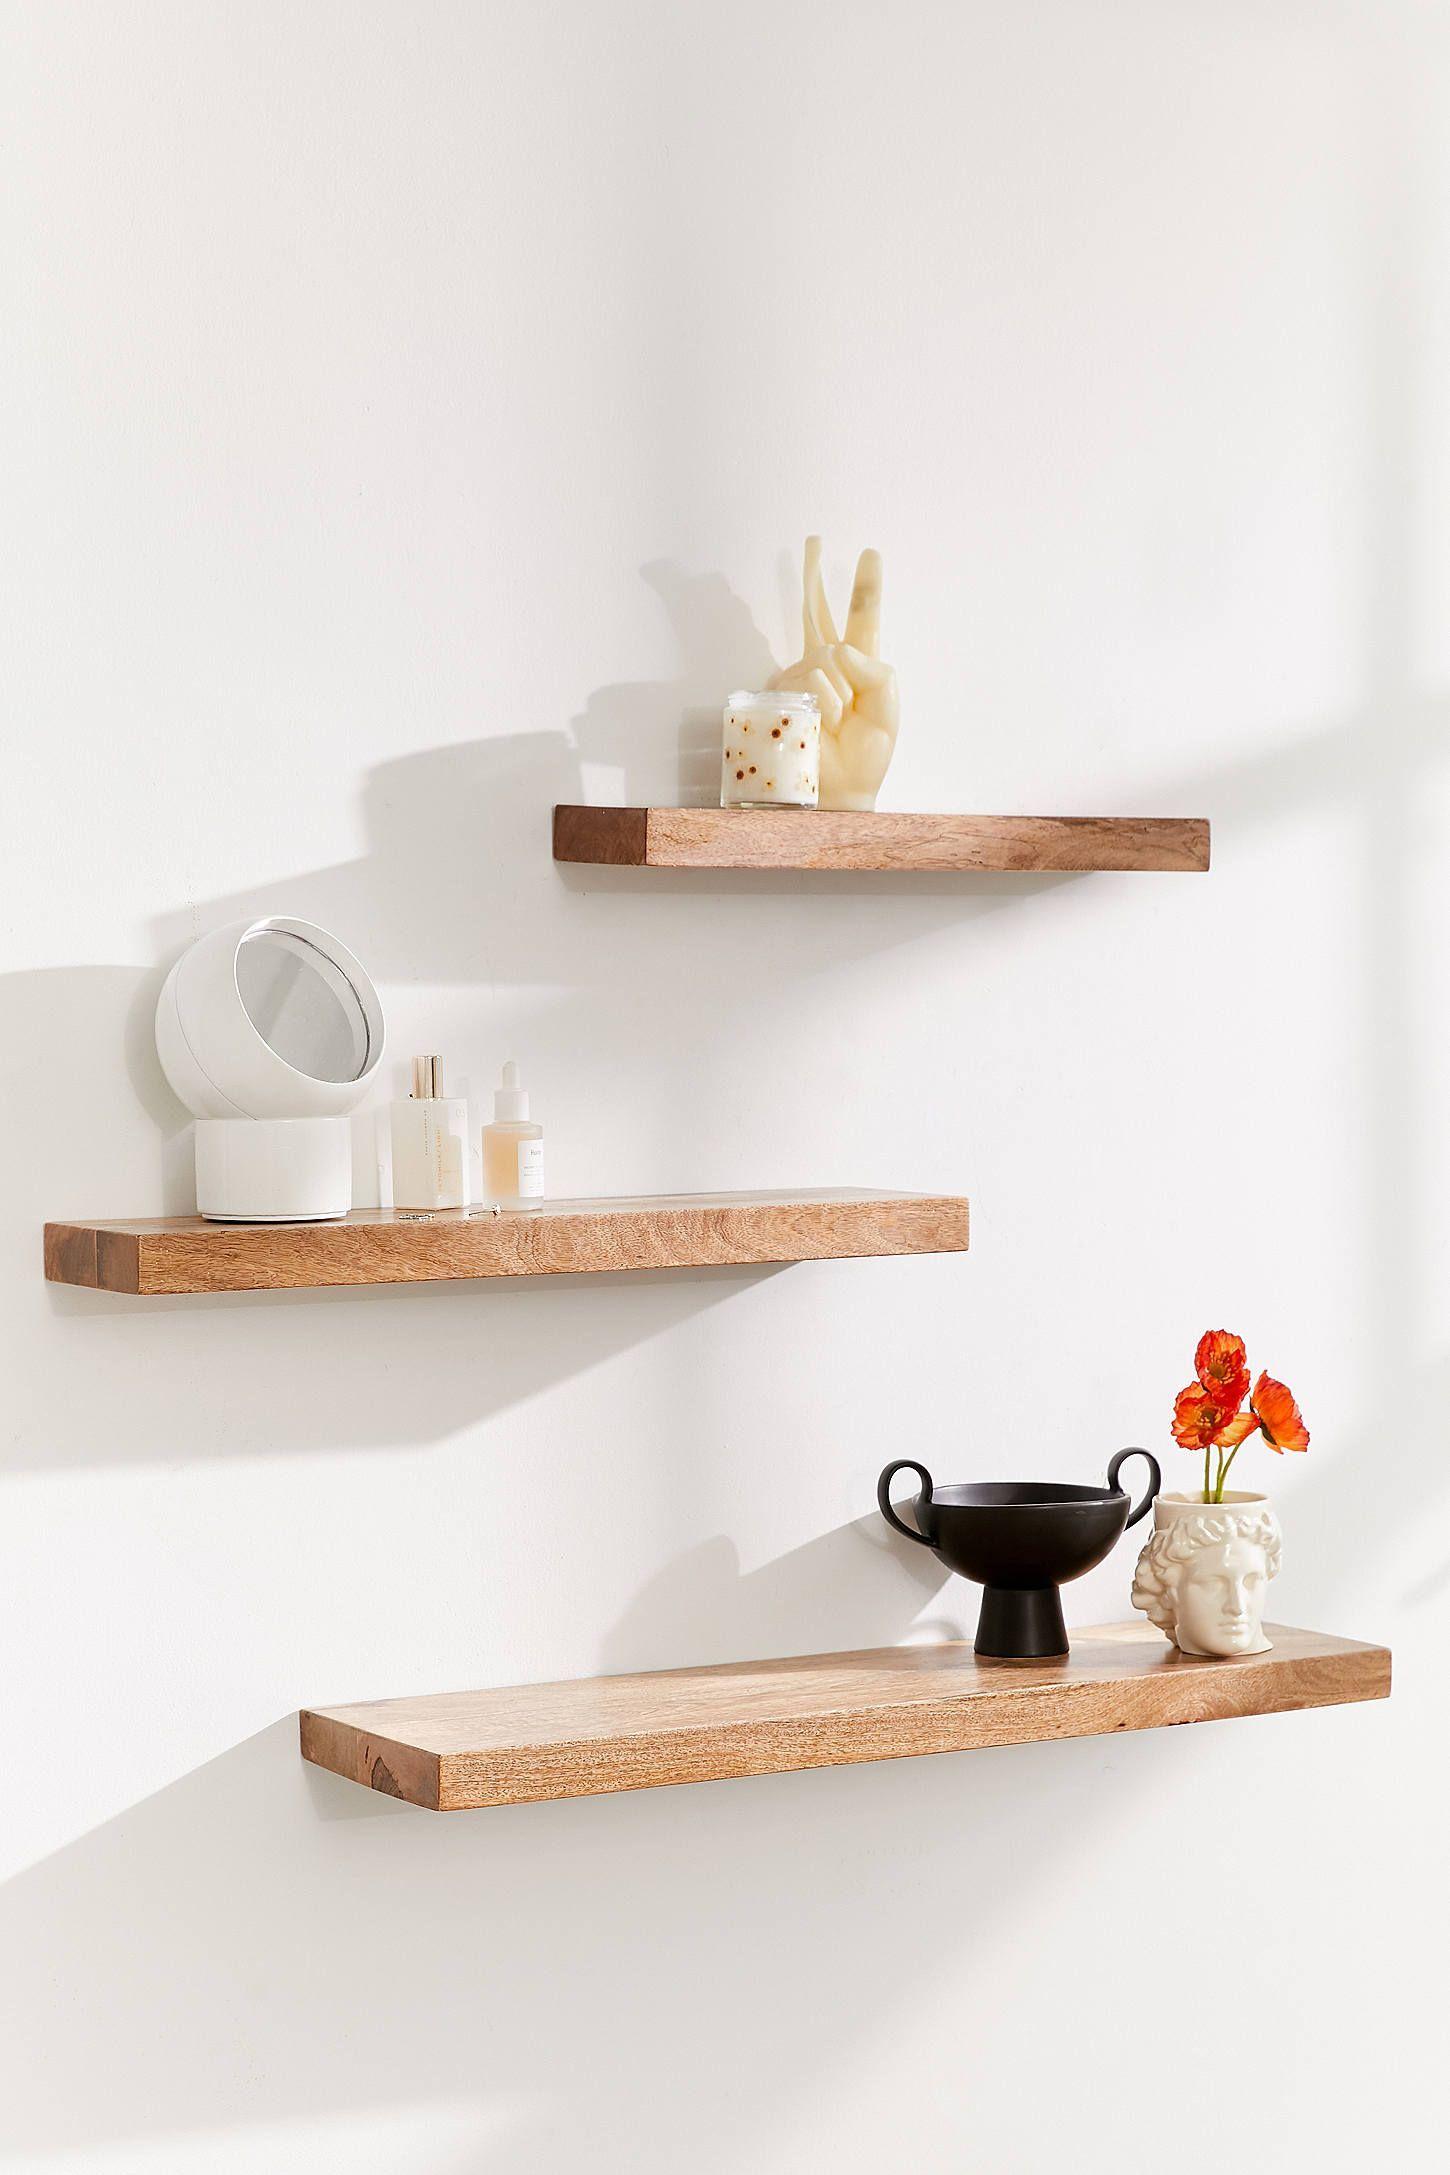 Simple Floating Wood Shelf Urban Outfitters Wood Wall Shelf